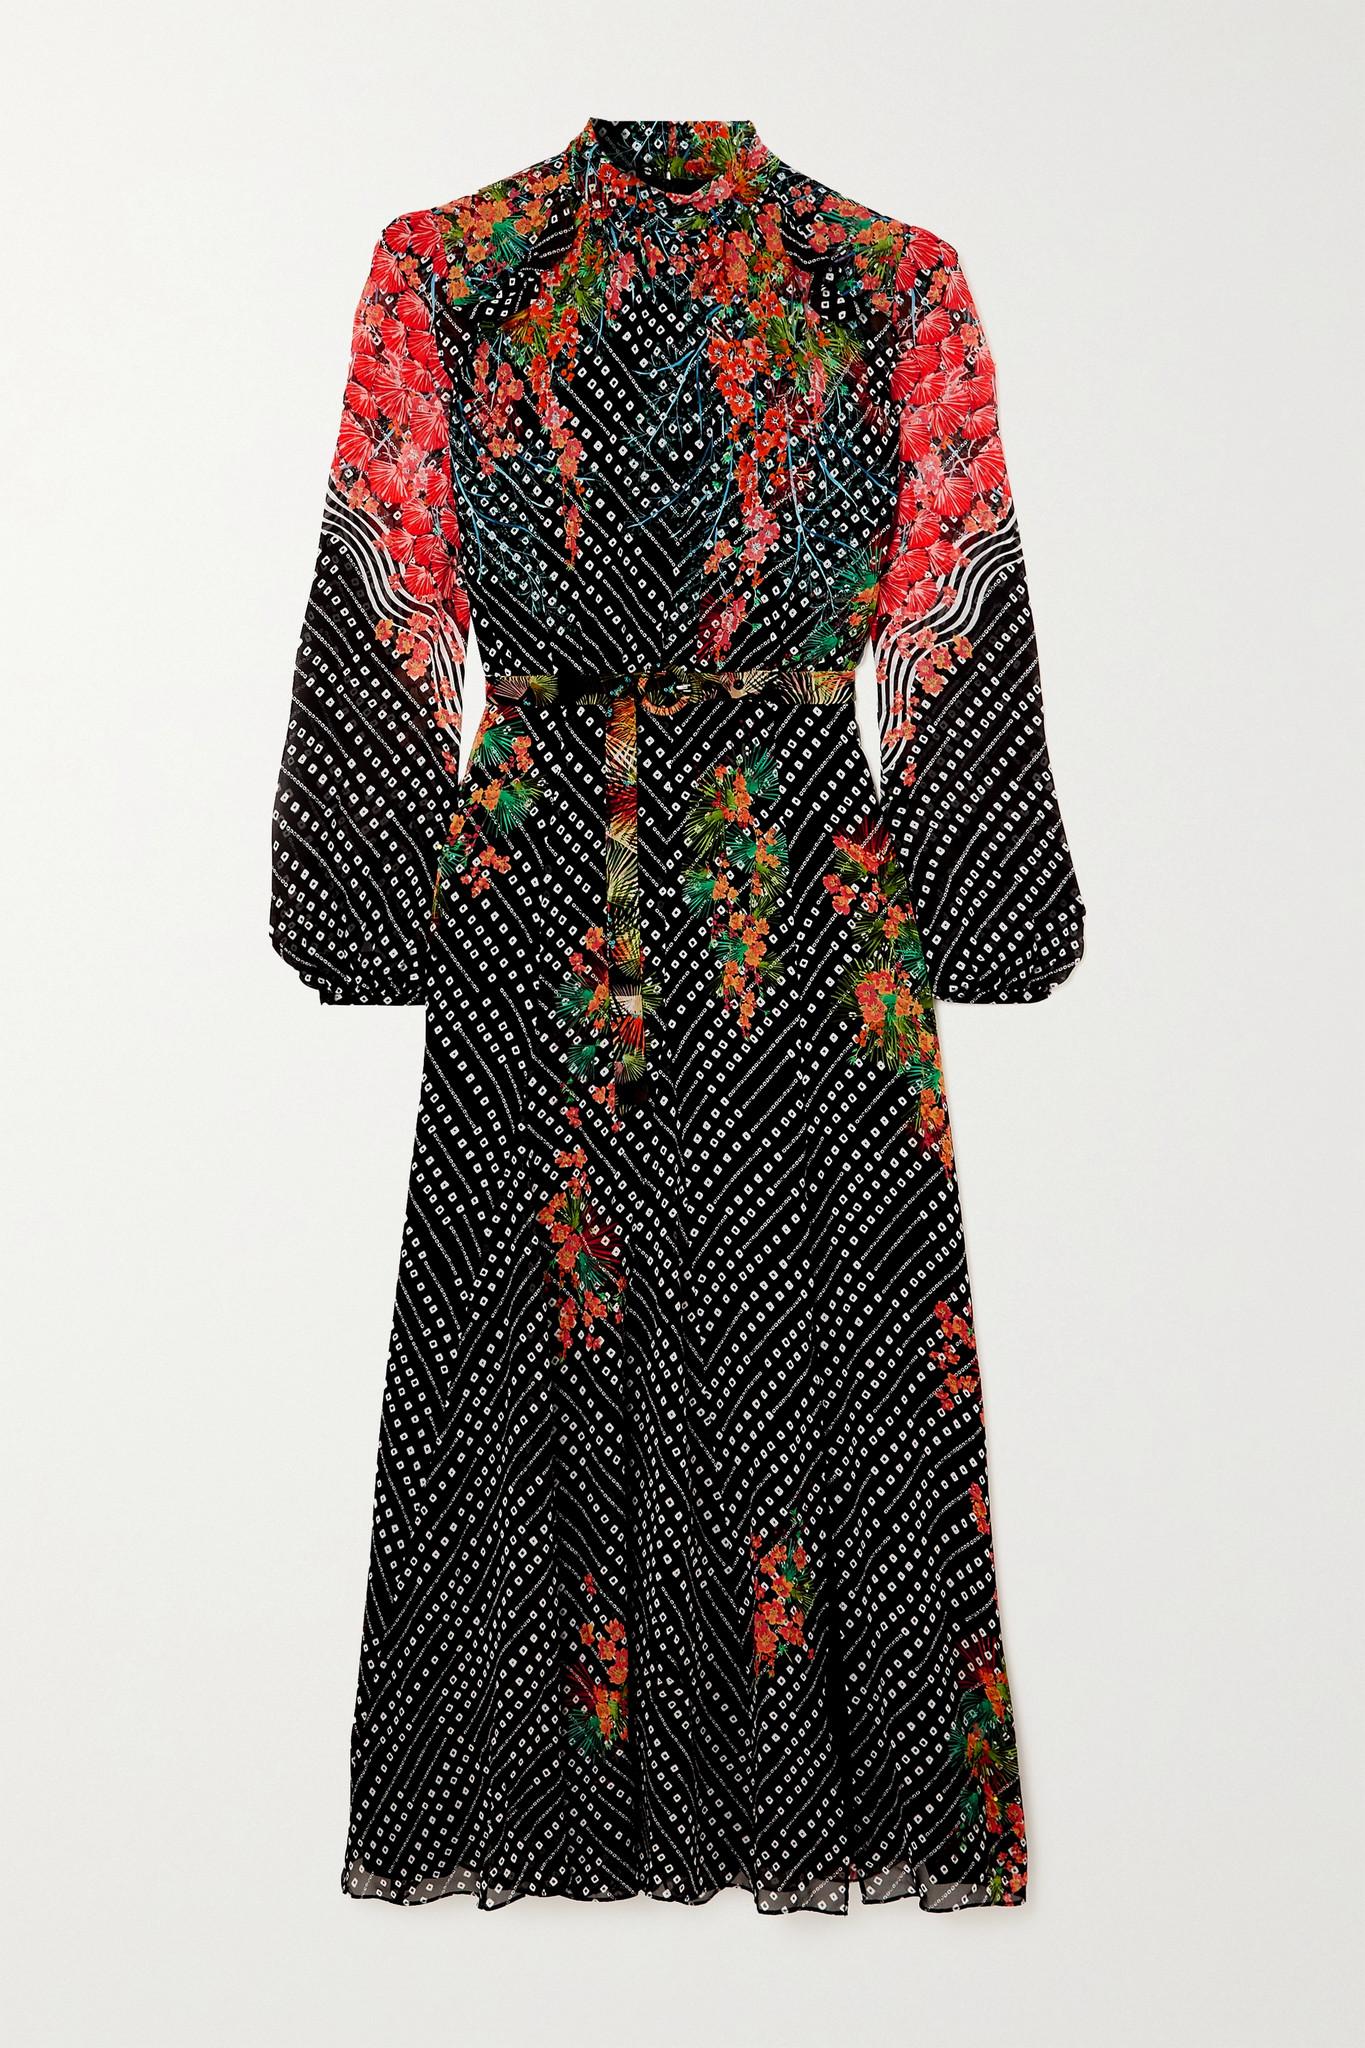 SALONI - Jacqui-b Belted Printed Silk-georgette Midi Dress - Blue - UK8